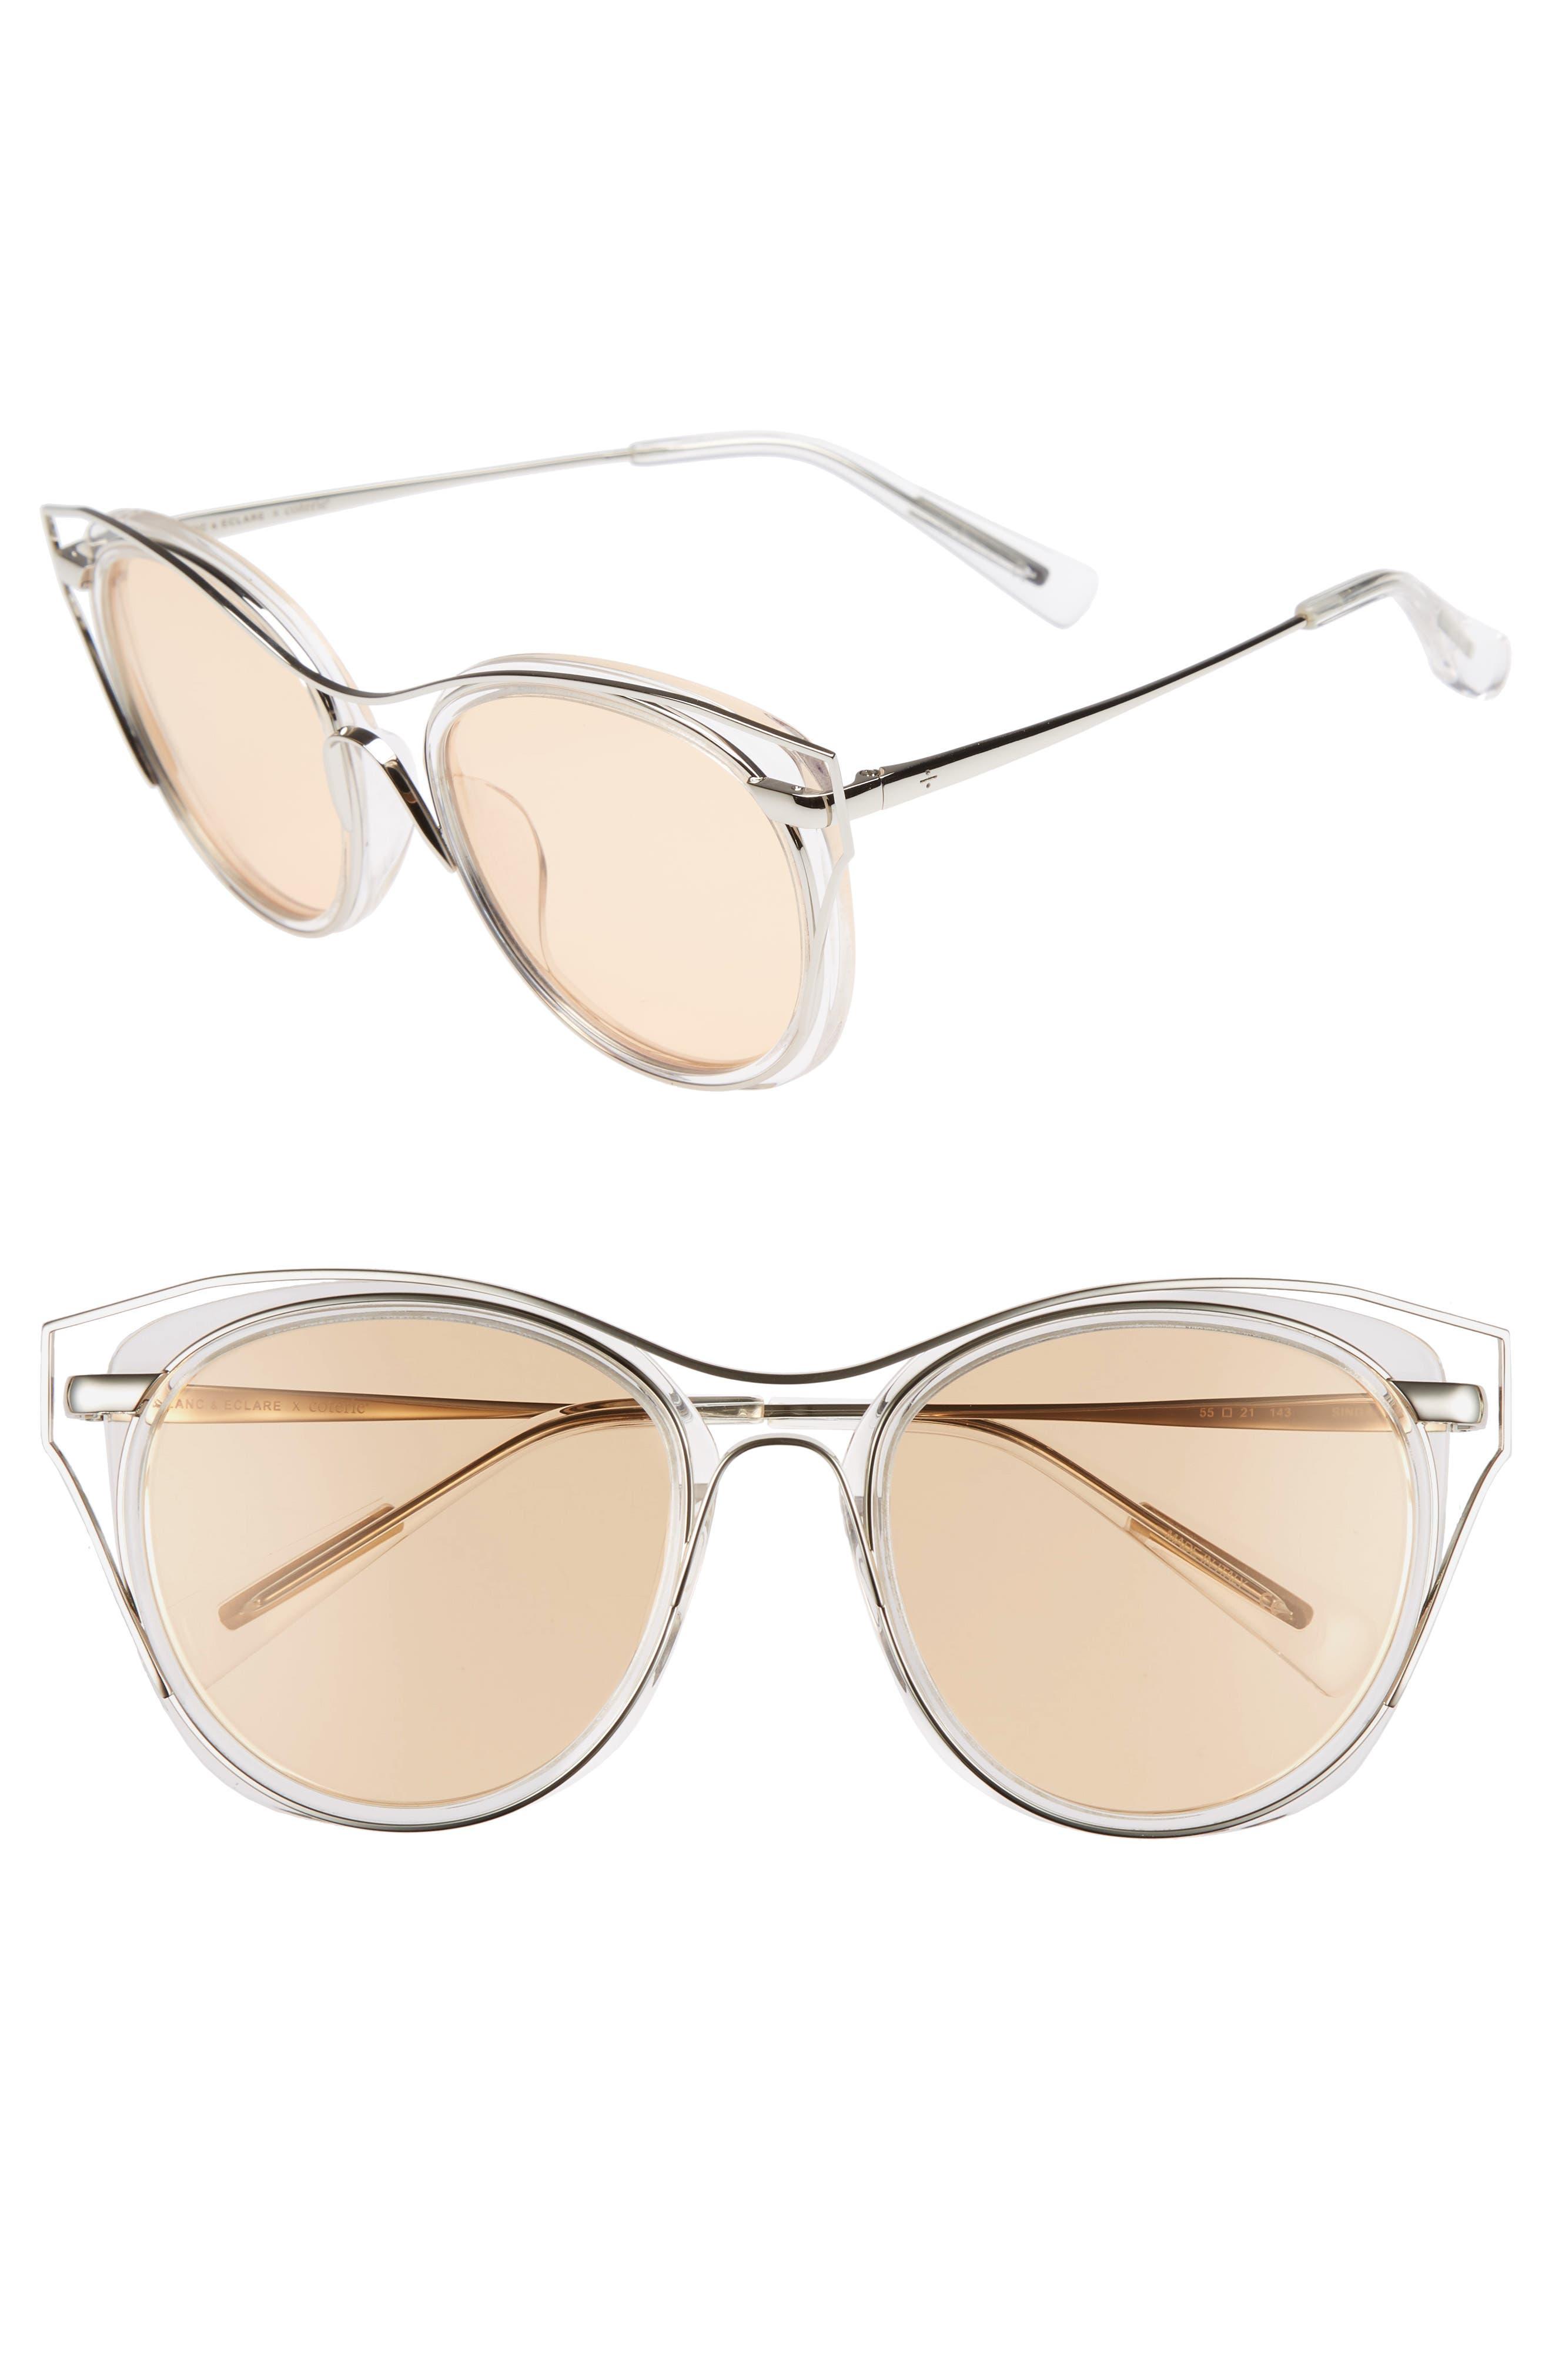 BLANC & ECLARE Singapore 55mm Polarized Sunglasses,                         Main,                         color, Transparent/ Slv/ Orange